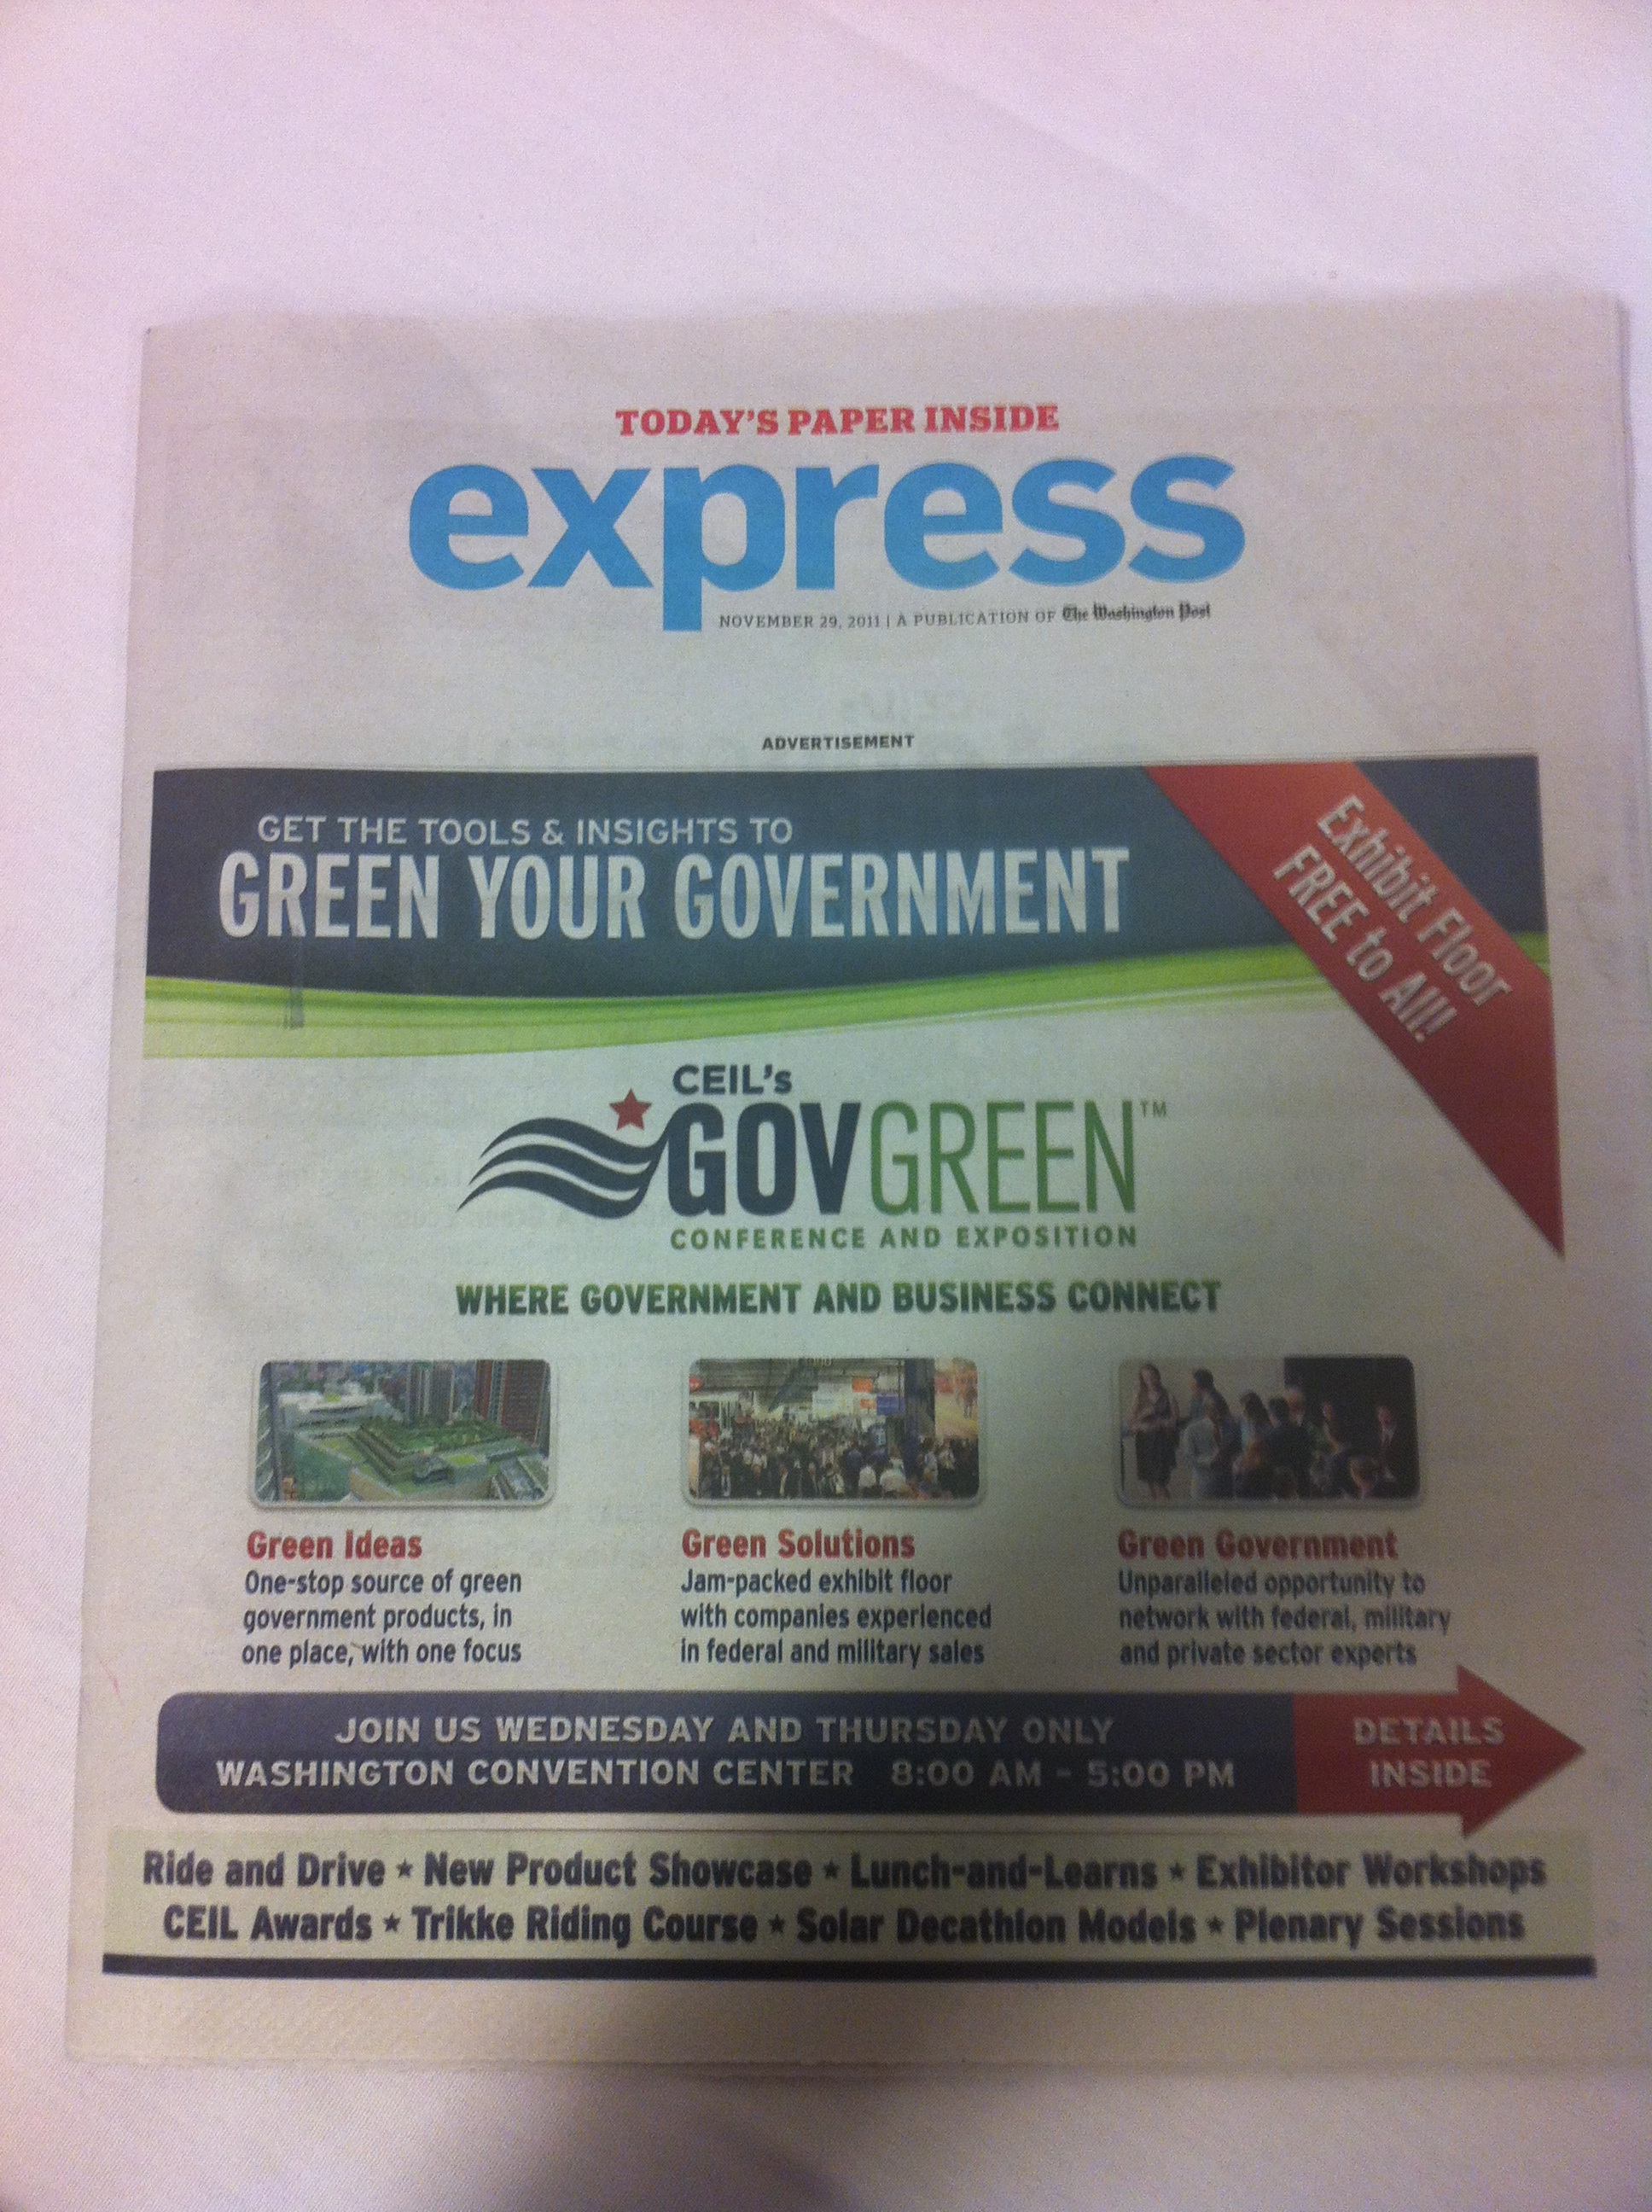 GOVgreen Express